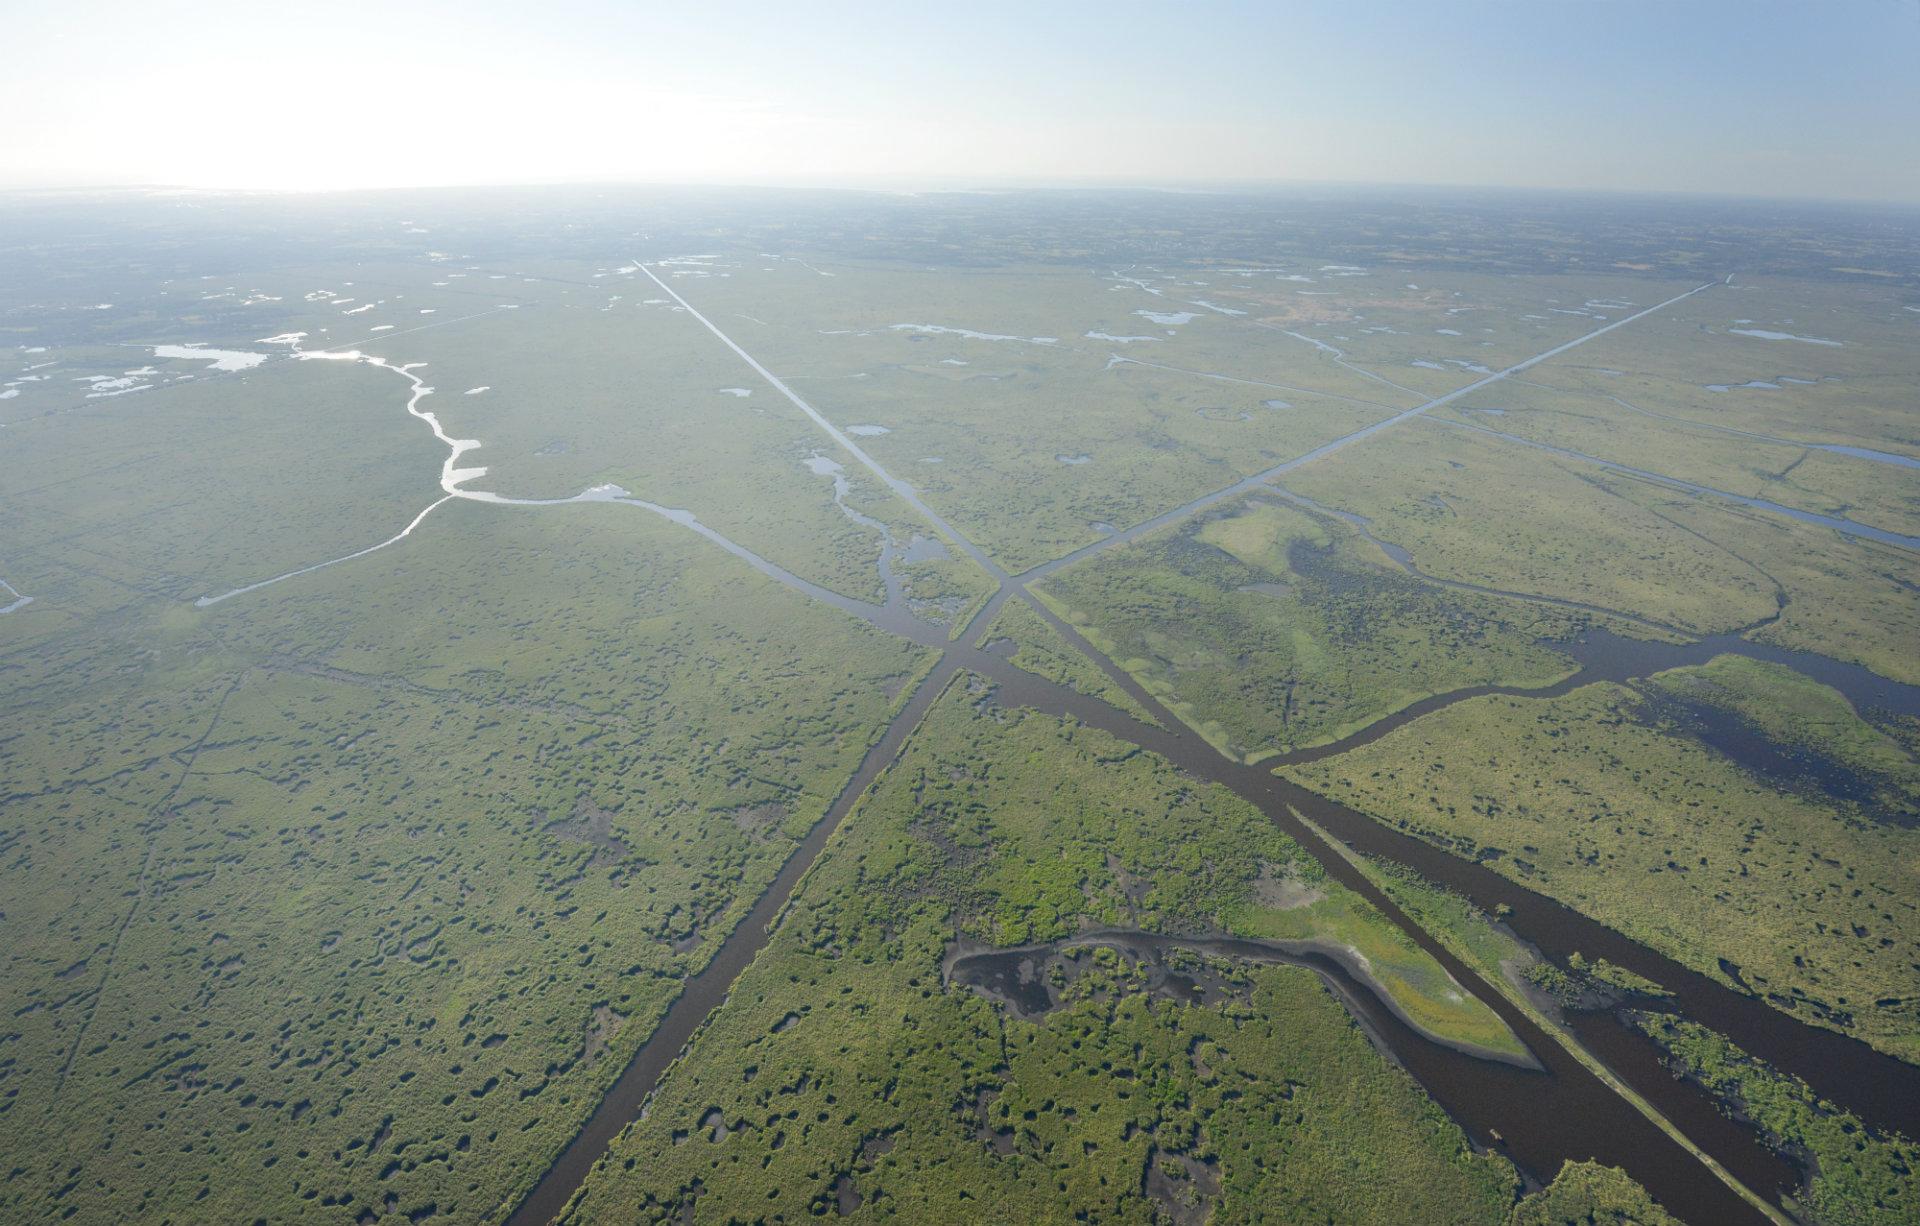 Les marais de Brière vus du ciel - Teddy Locquard - © Teddy Locquard